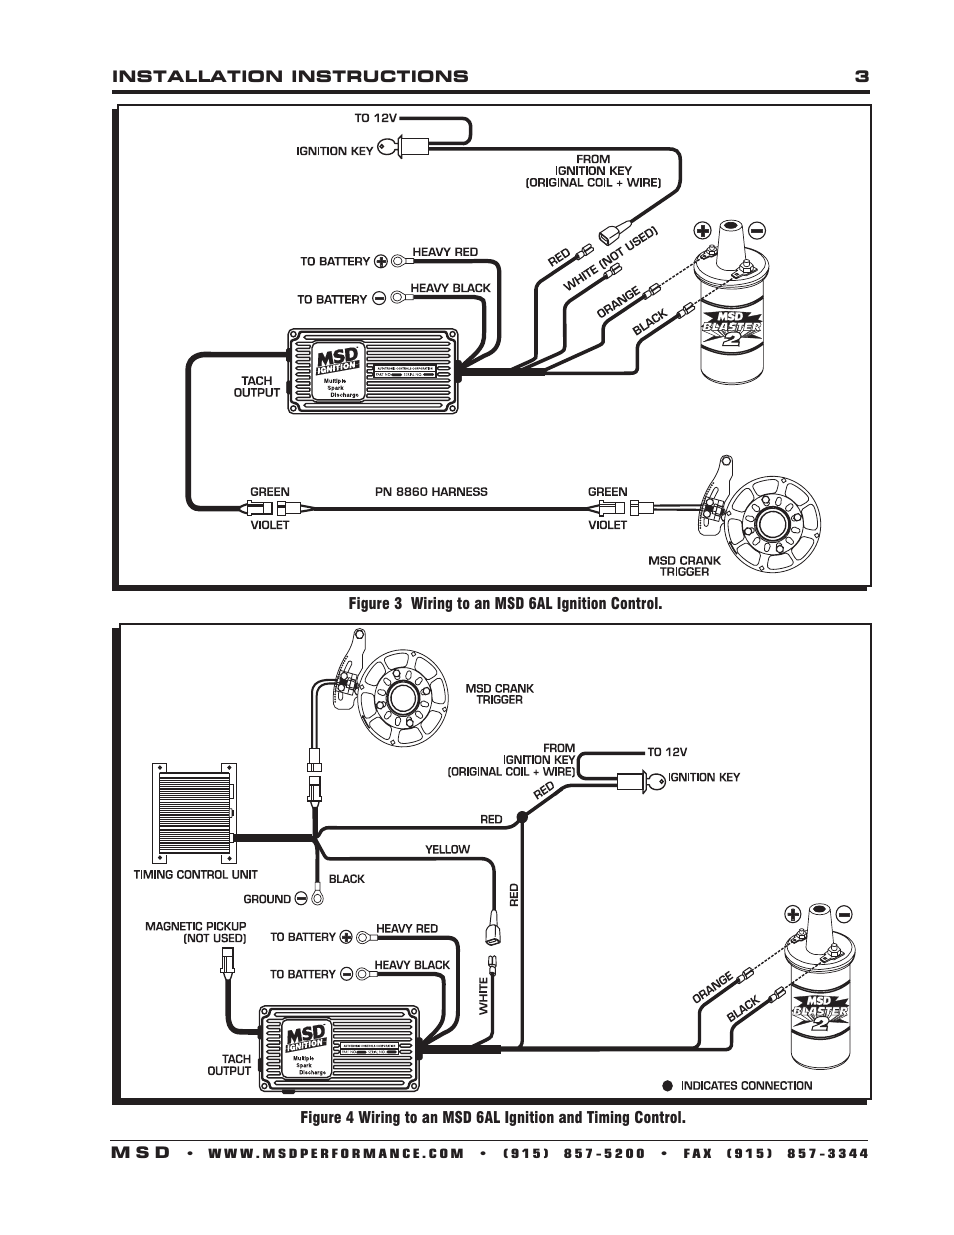 msd wiring diagram ef 8757  msd crank trigger wiring diagram wiring diagram msd wiring diagrams and technotes msd crank trigger wiring diagram wiring